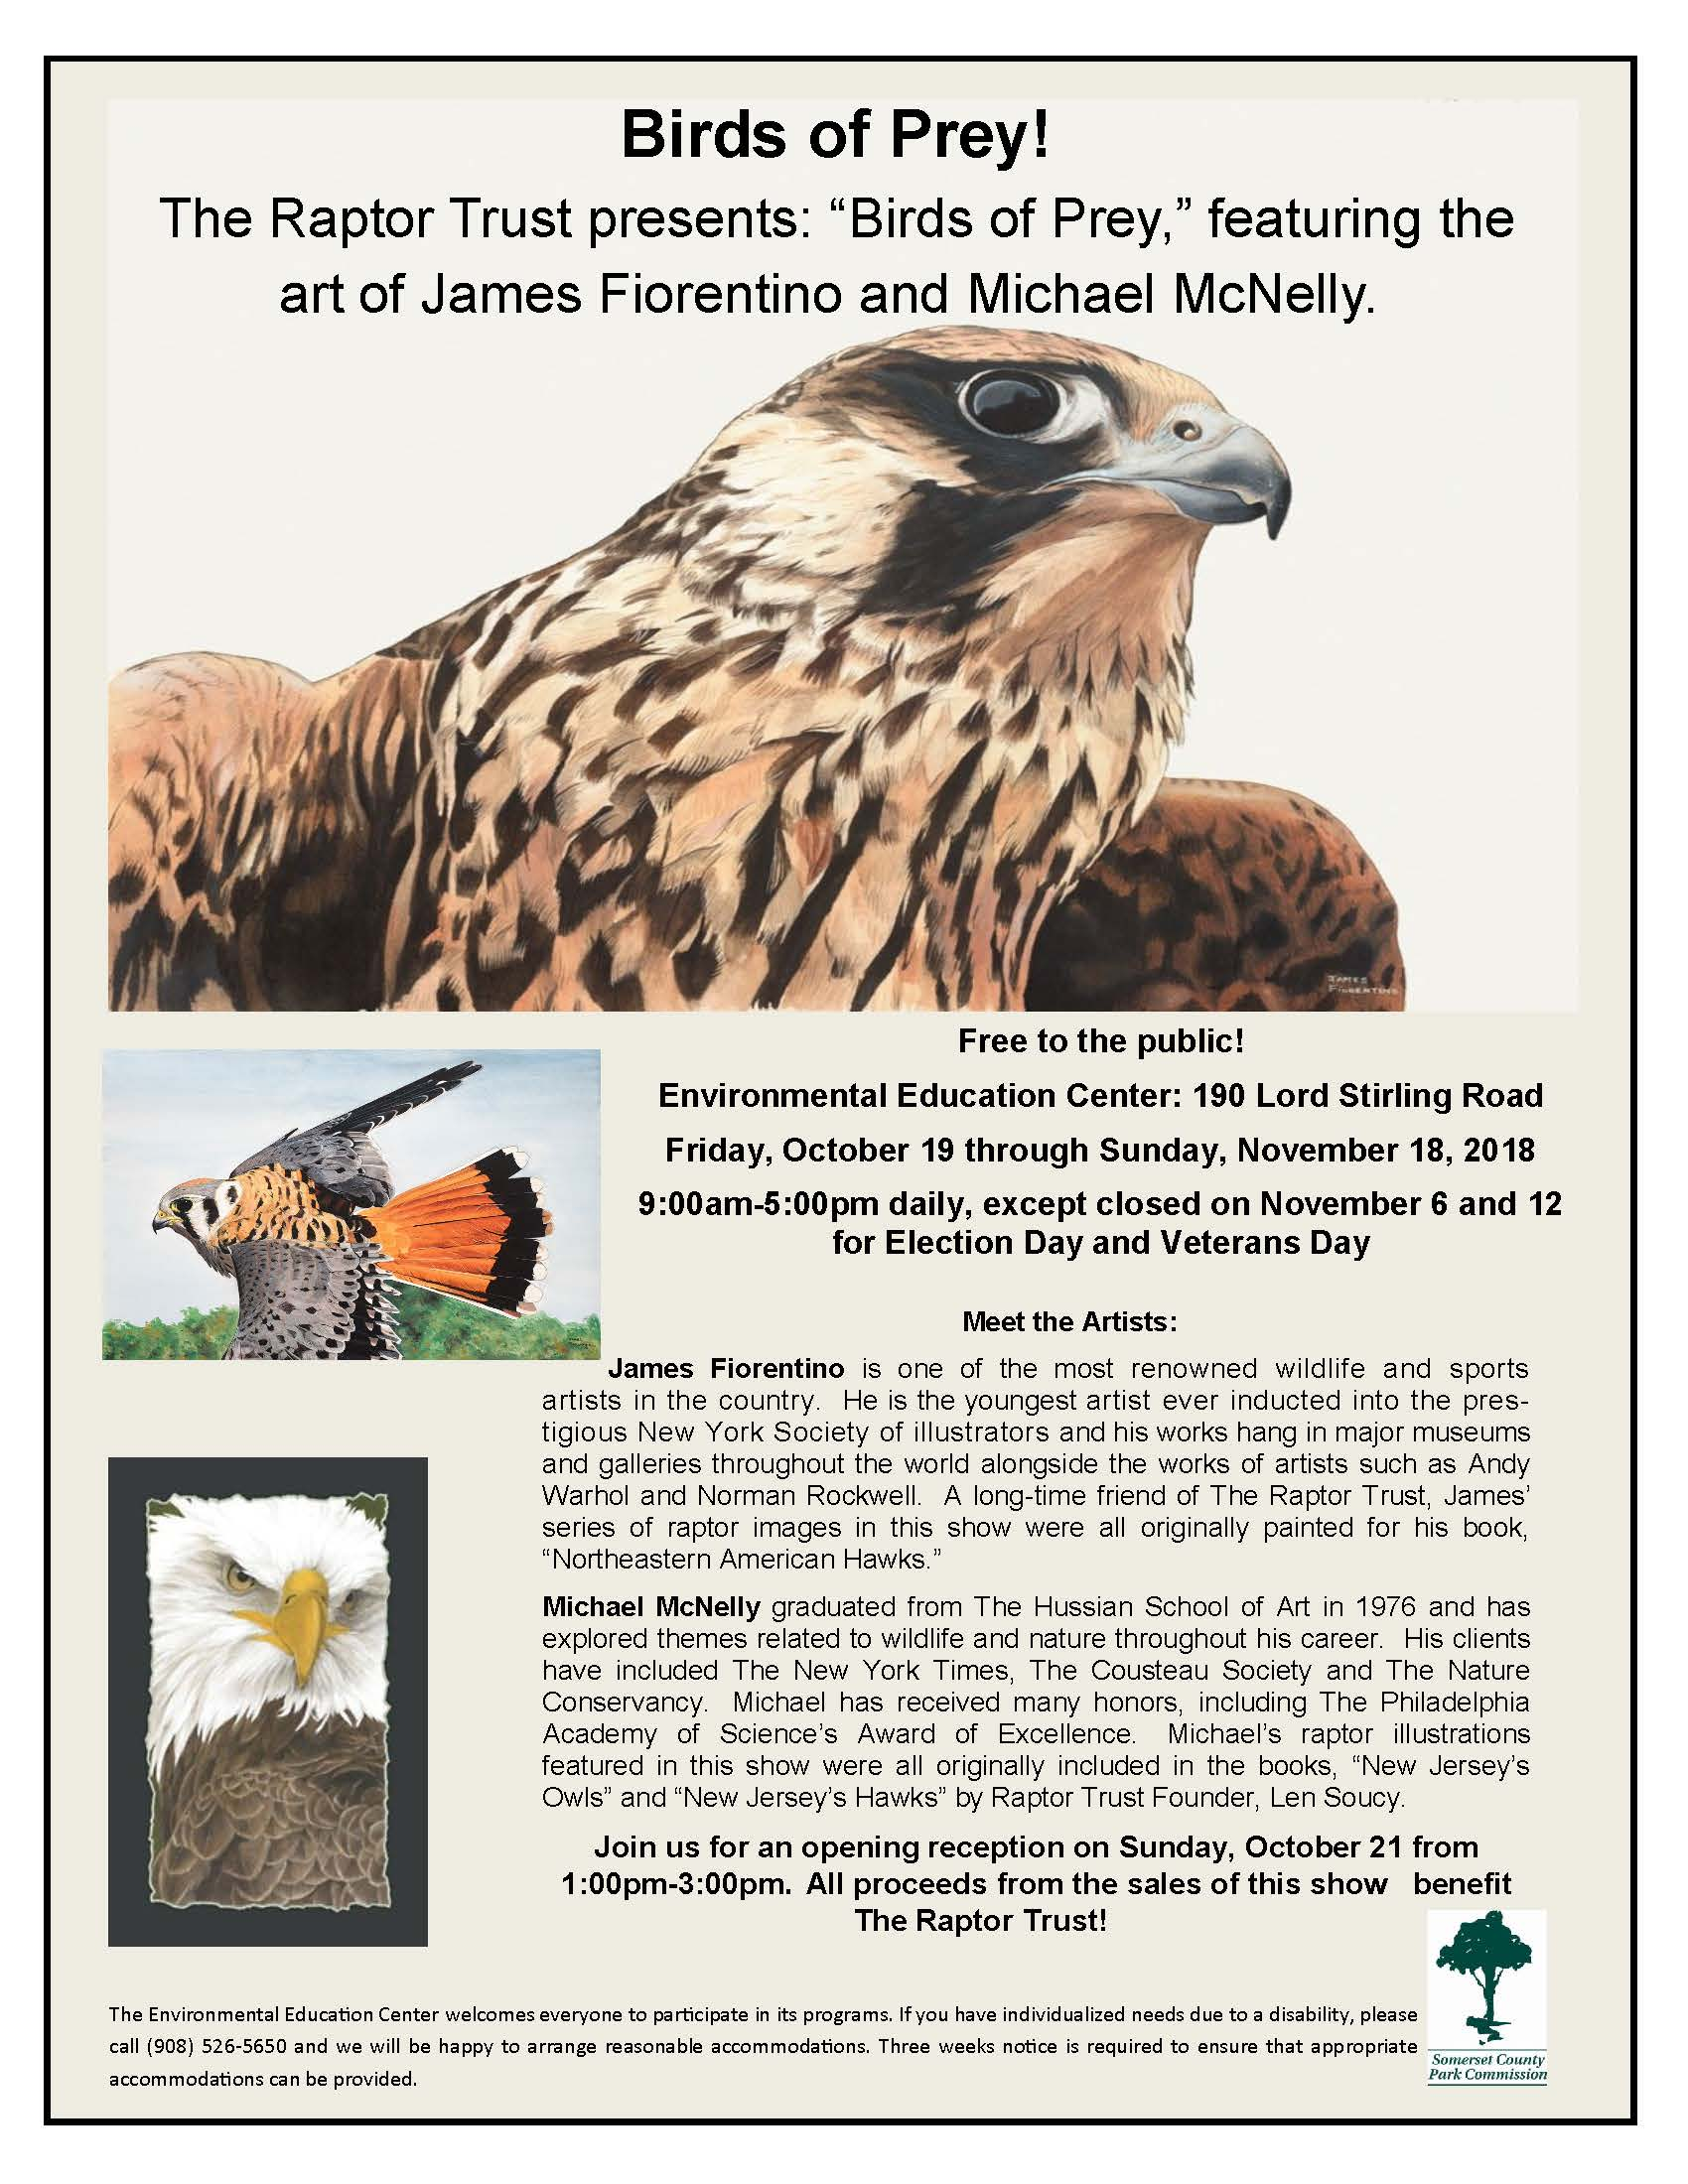 Birds of Prey Flier.jpg